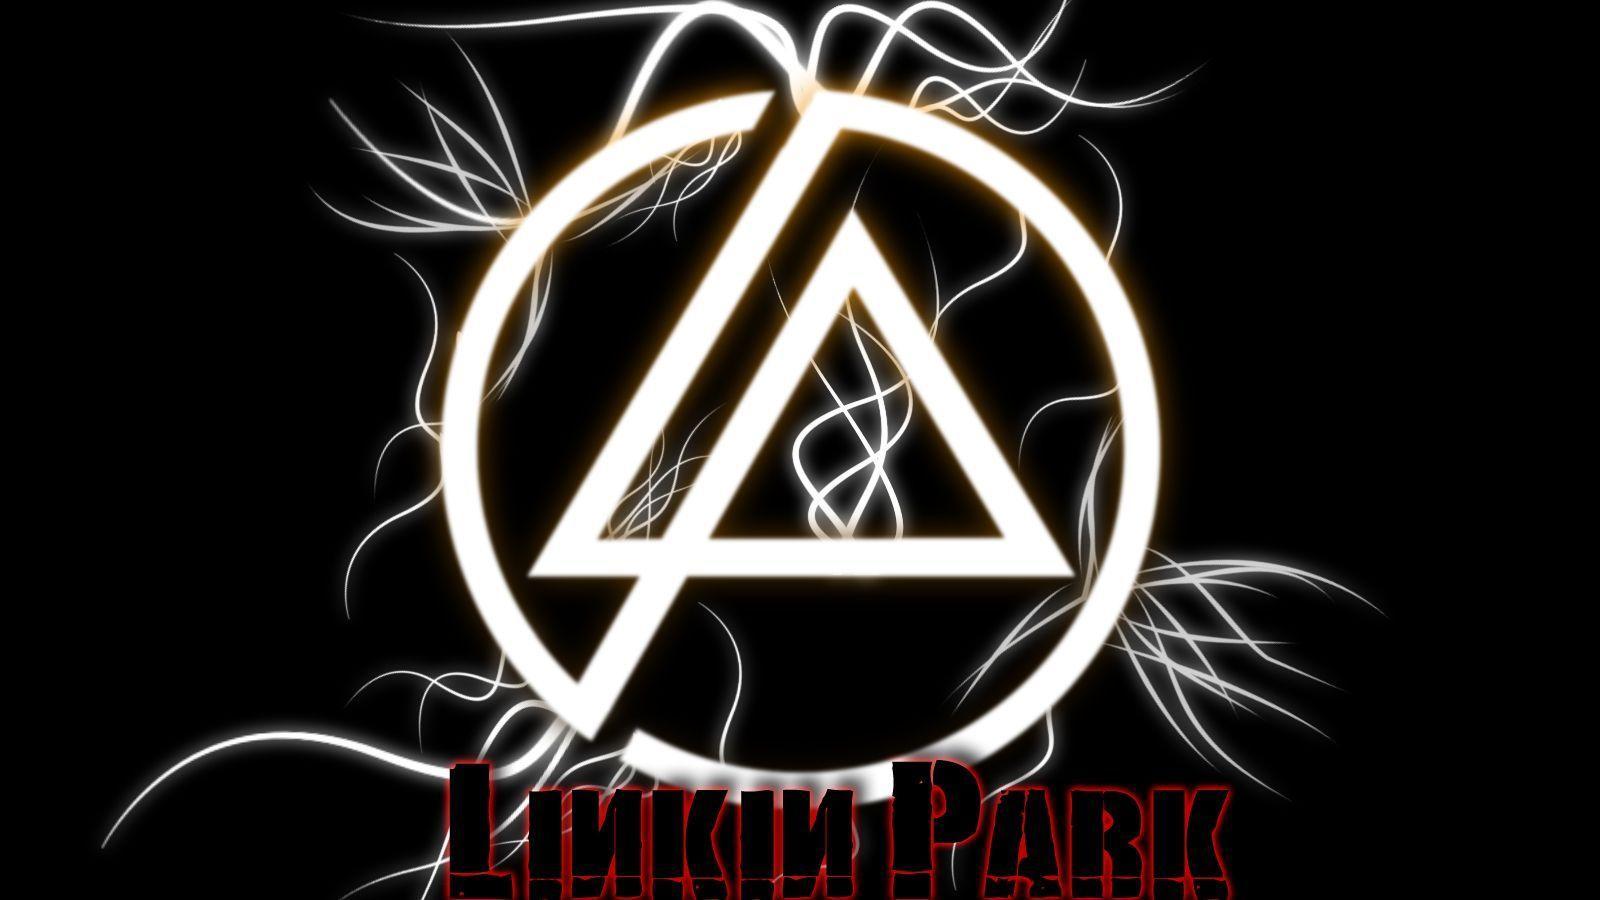 Linkin Park Logo 2016 Wallpapers